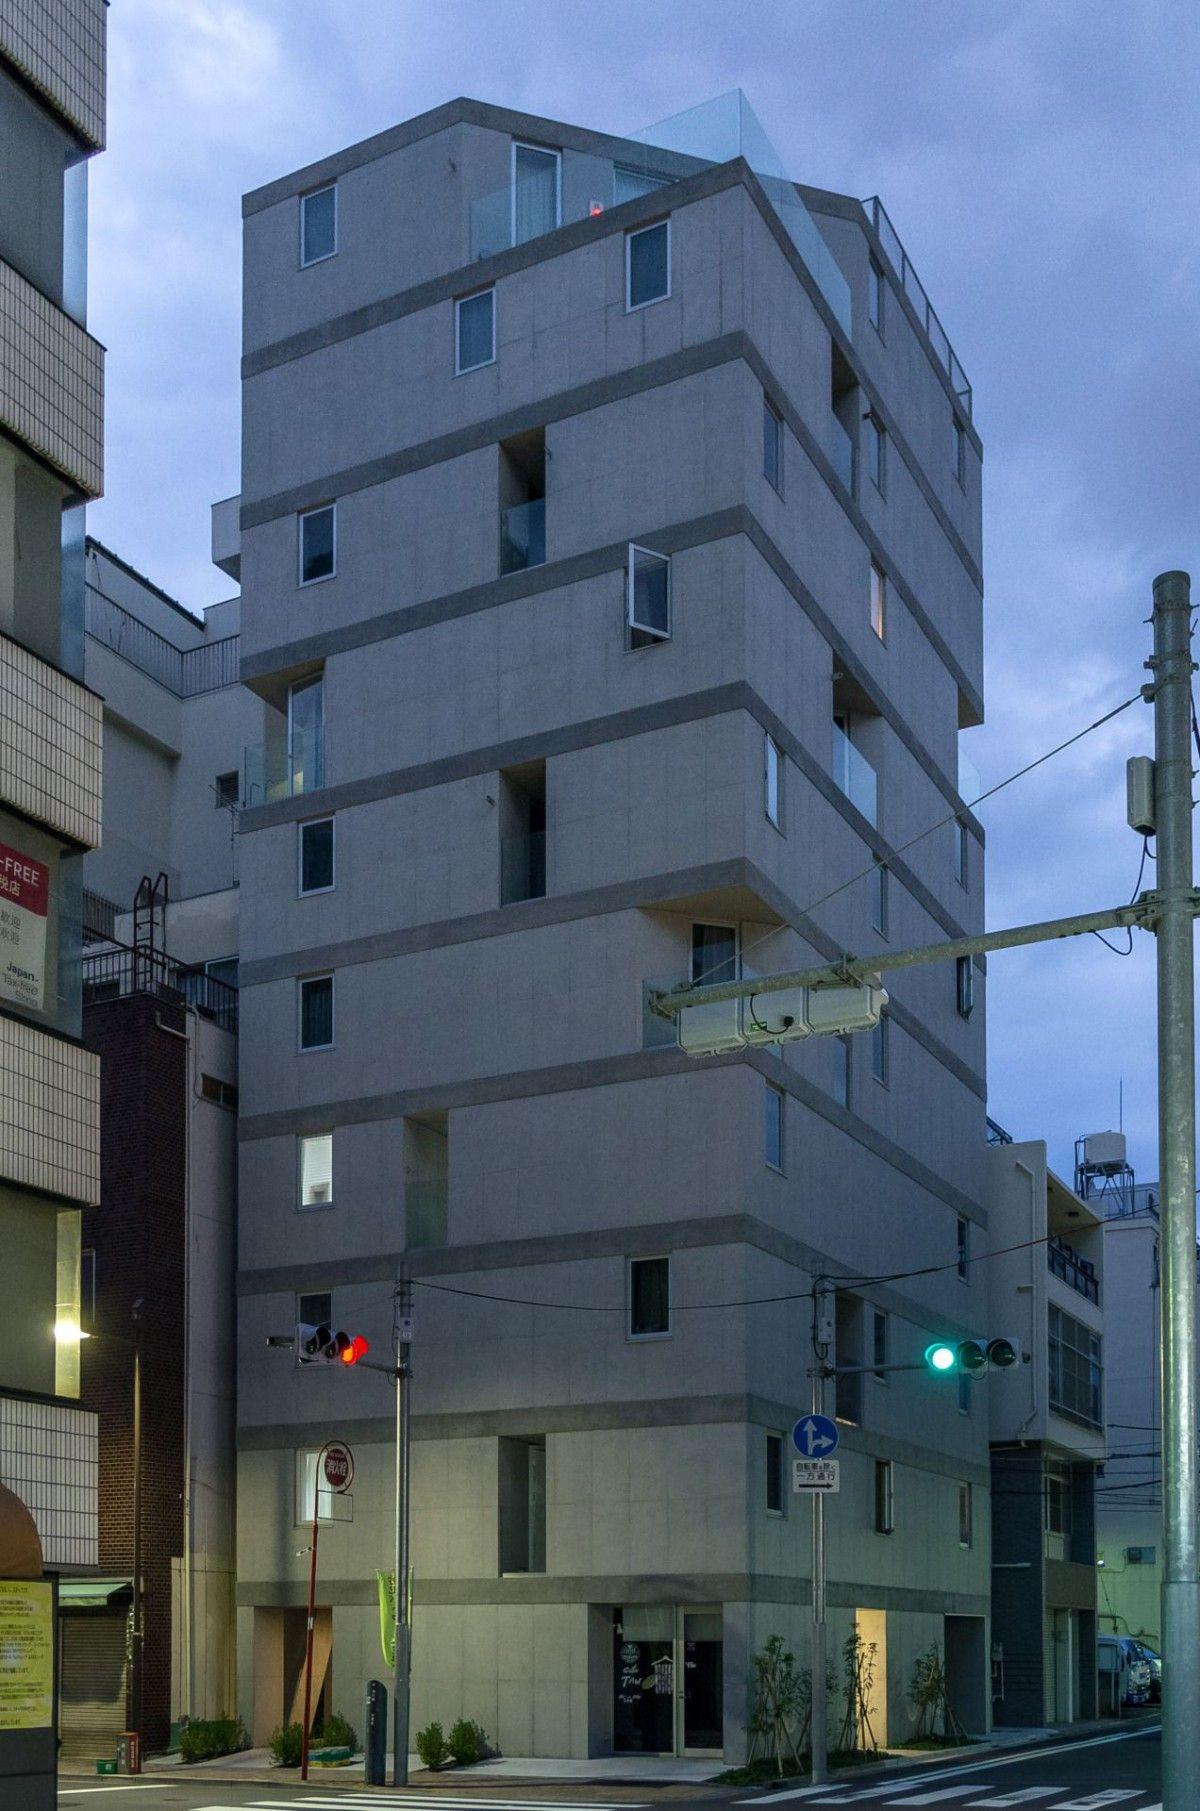 10bf7f5bfea6d4bc7c2b8e6d701add34 go hasegawa apartment in okachimachi tokyo (3) go hasegawa  at panicattacktreatment.co